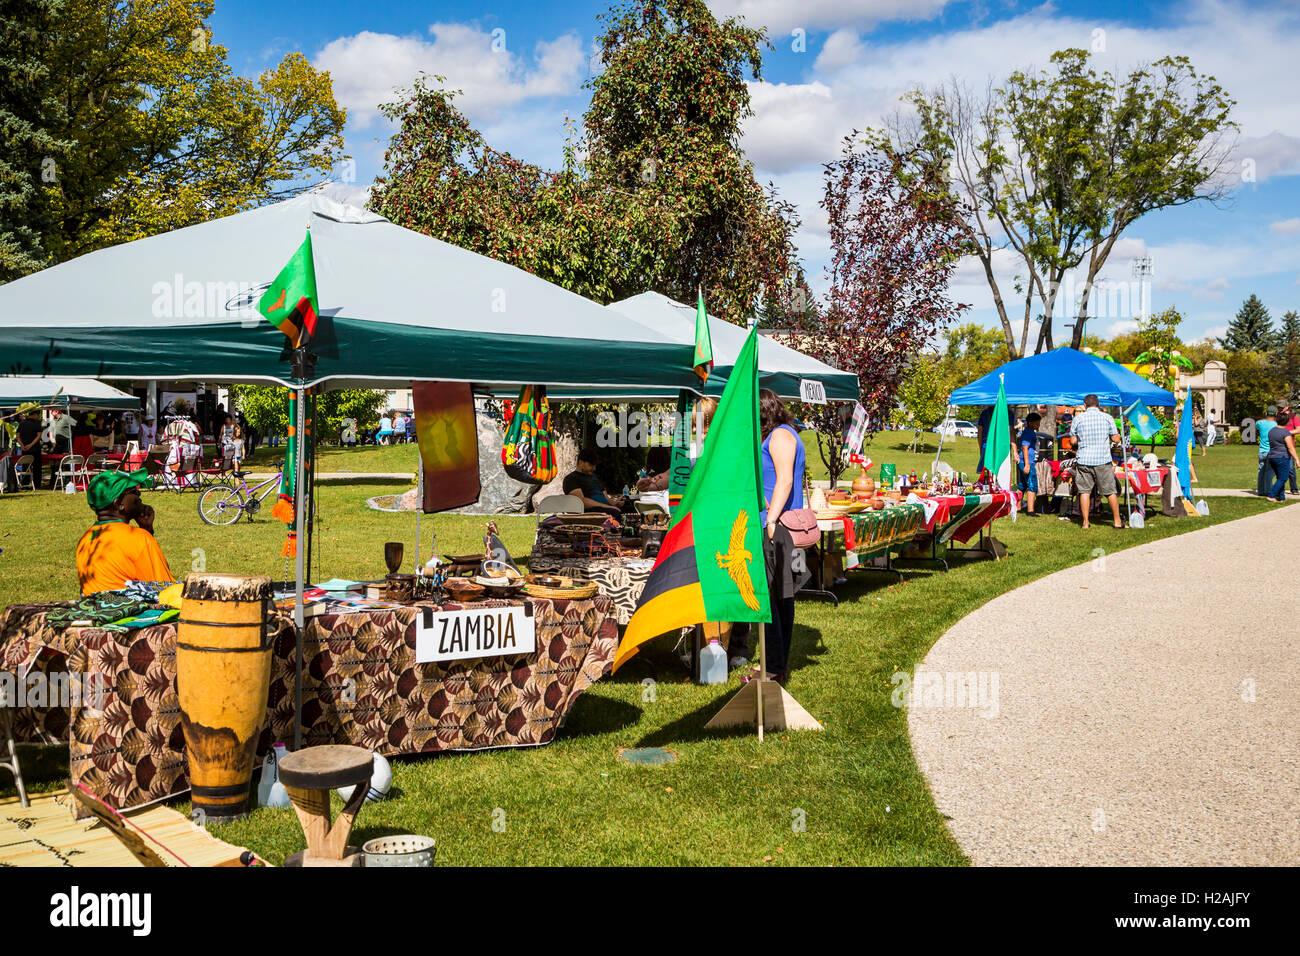 Culture Fest 2016 held in the Bethel Heritage Park, Winkler, Manitoba, Canada. - Stock Image